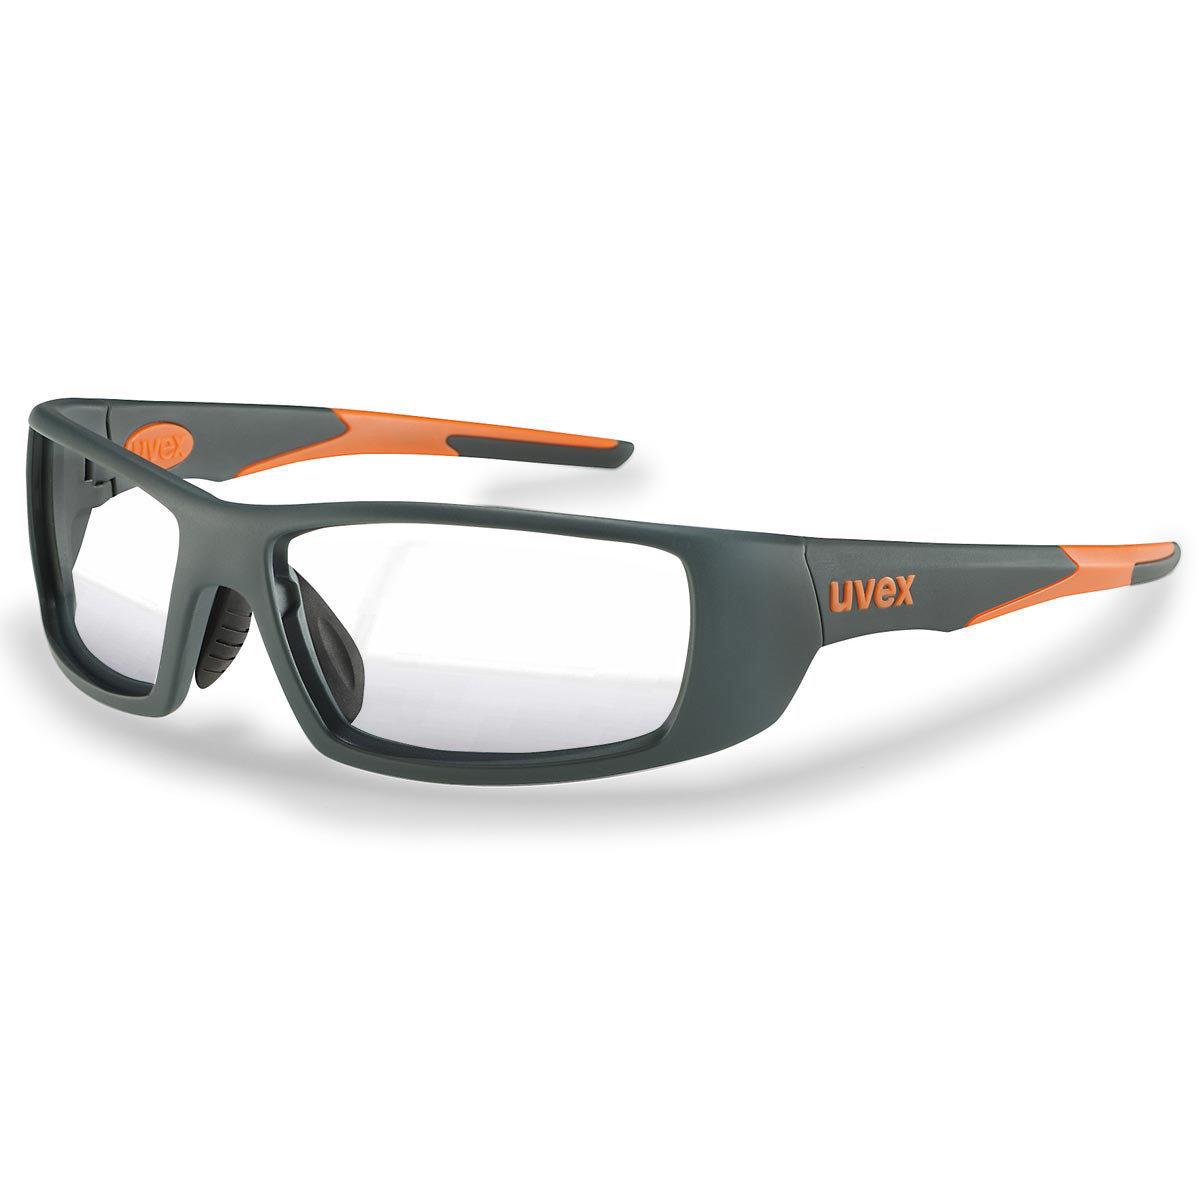 Uvex Korrektionsschutzbrille RX sp 5512 orange - UV blue protect